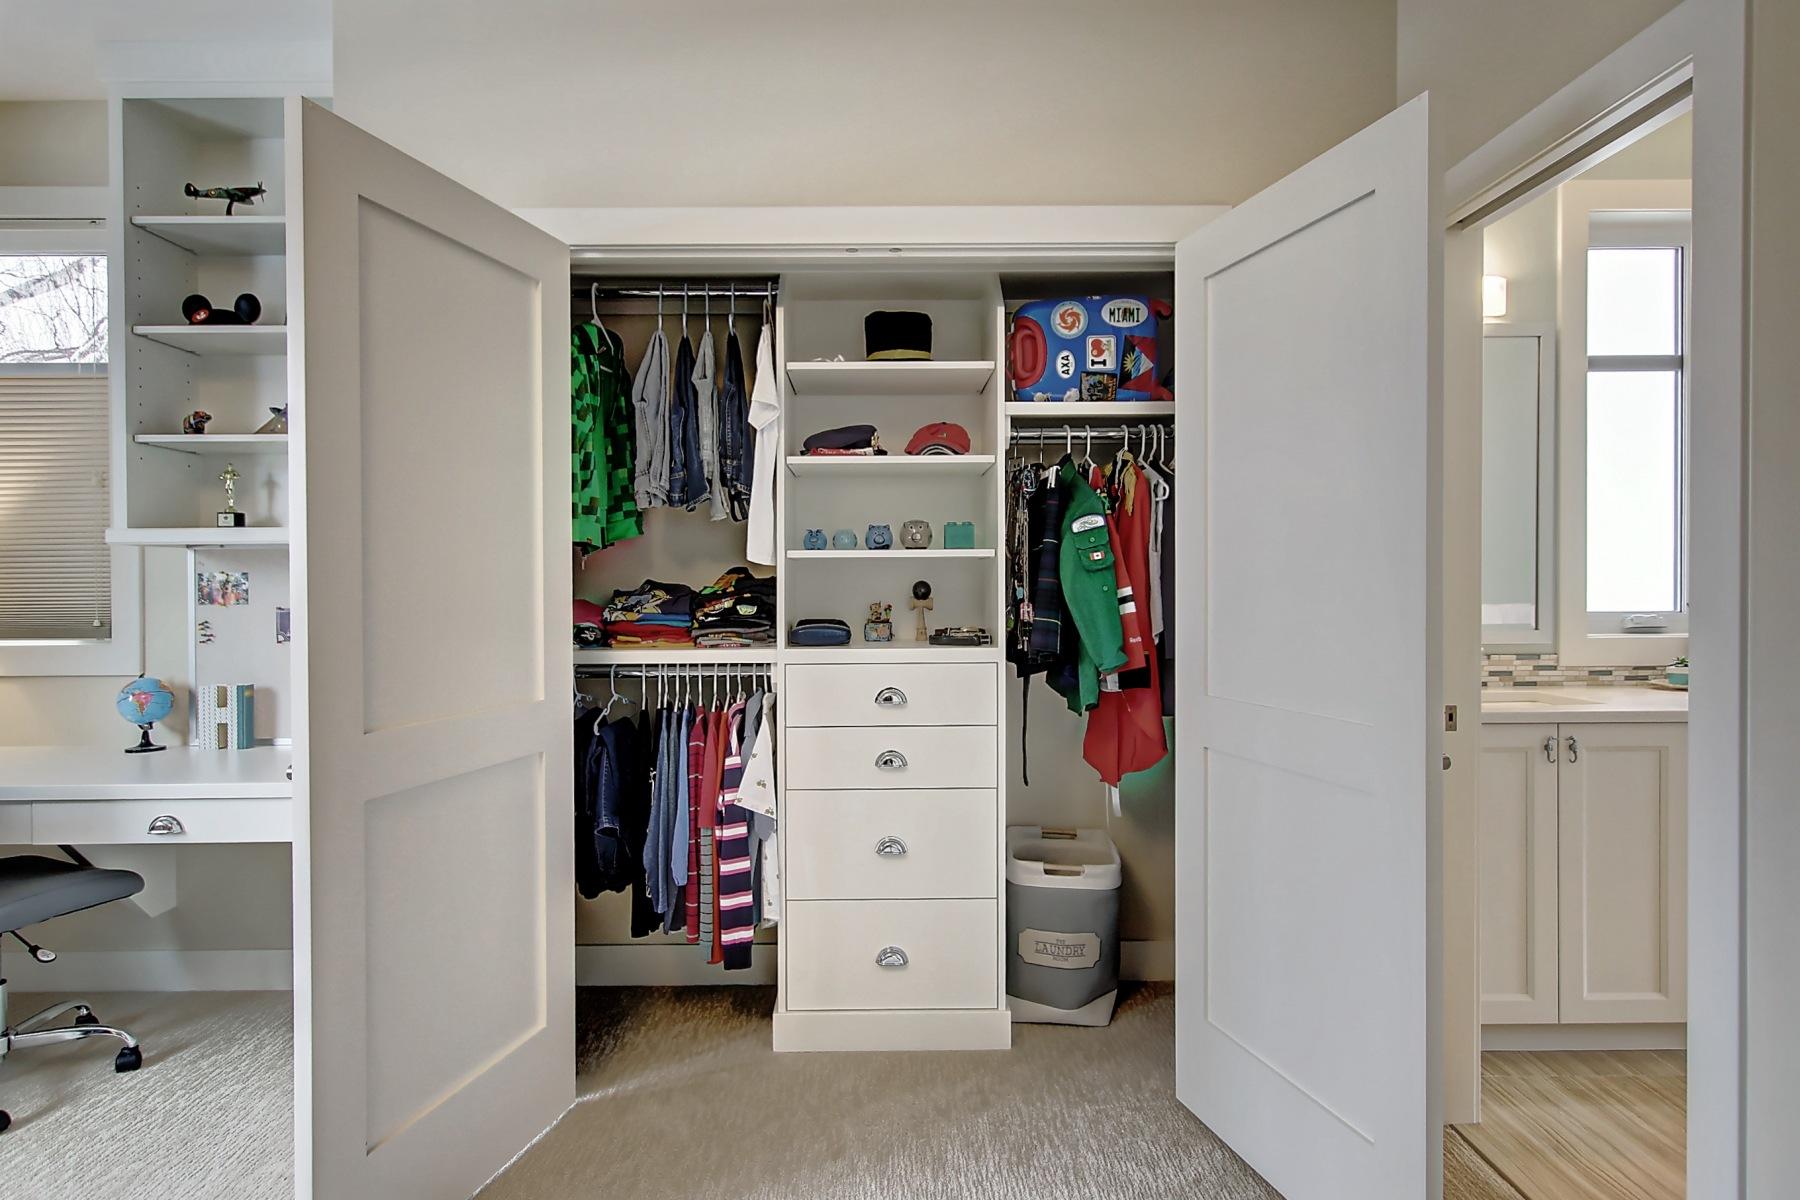 bg-bedroom-2-closet-built-in-45.Higher_Res.2832_25A_St_SW.011600